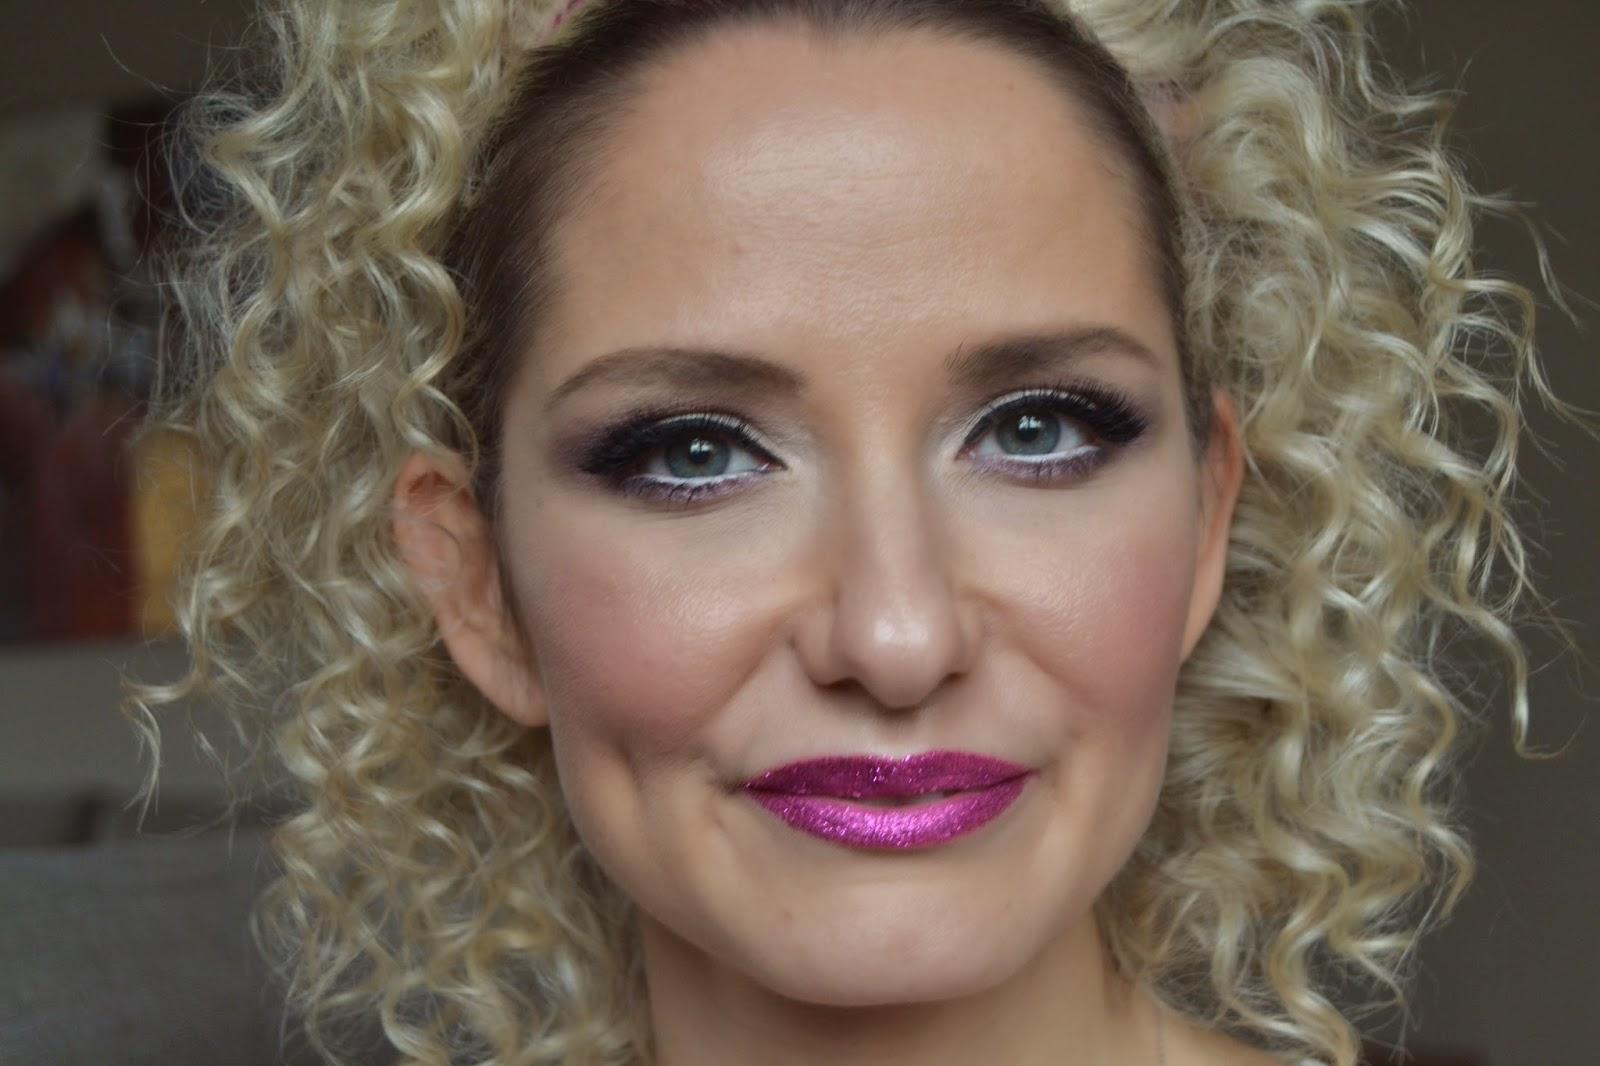 youtuber - makyaj bloğu - yılbaşı makyajı - yeni yıl makyajı- new year makeup - pembe defter -  kozmetik blogları - pembe ruj makyajı - mac - candy yum yum- too faced - glitter lips